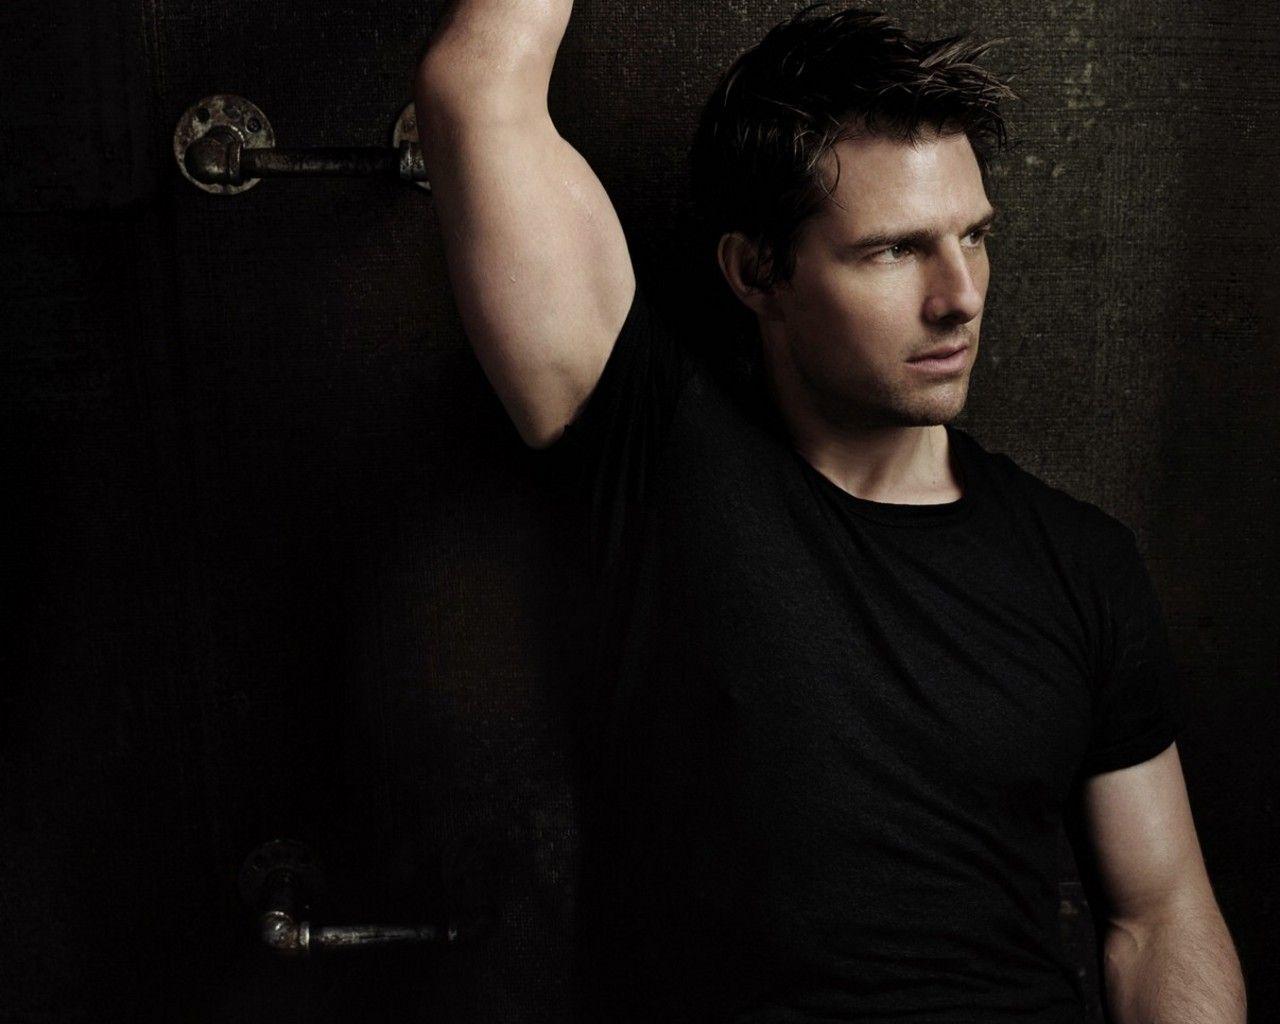 Tom Cruise Celebrity HD Wallpaper